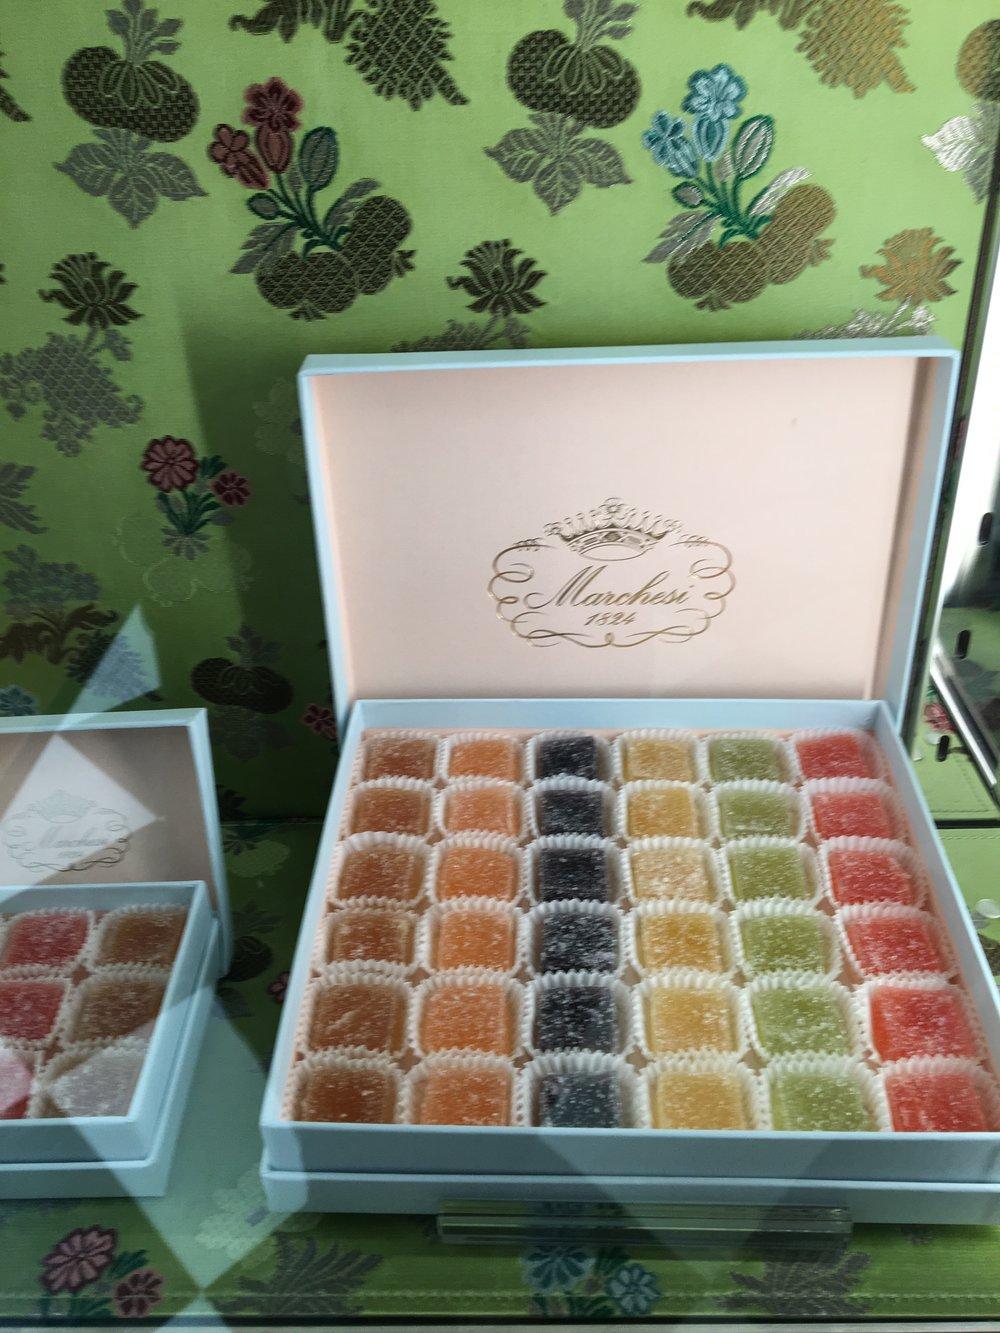 Marchesi soft jelly box .jpg